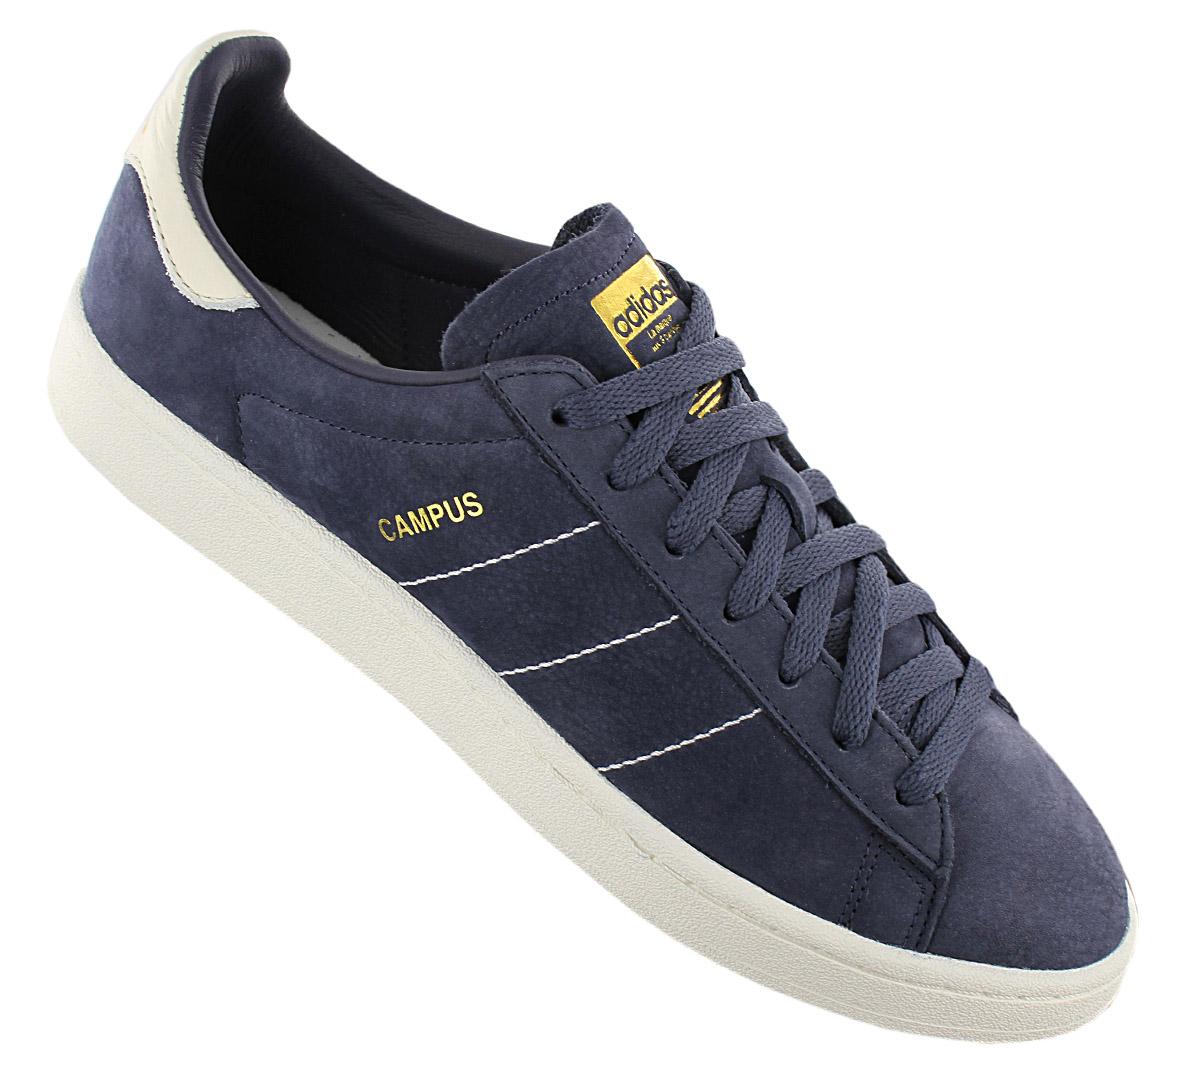 Details zu adidas Originals Campus Herren Sneaker Schuhe CQ2047 Leder Blau Turnschuhe NEU